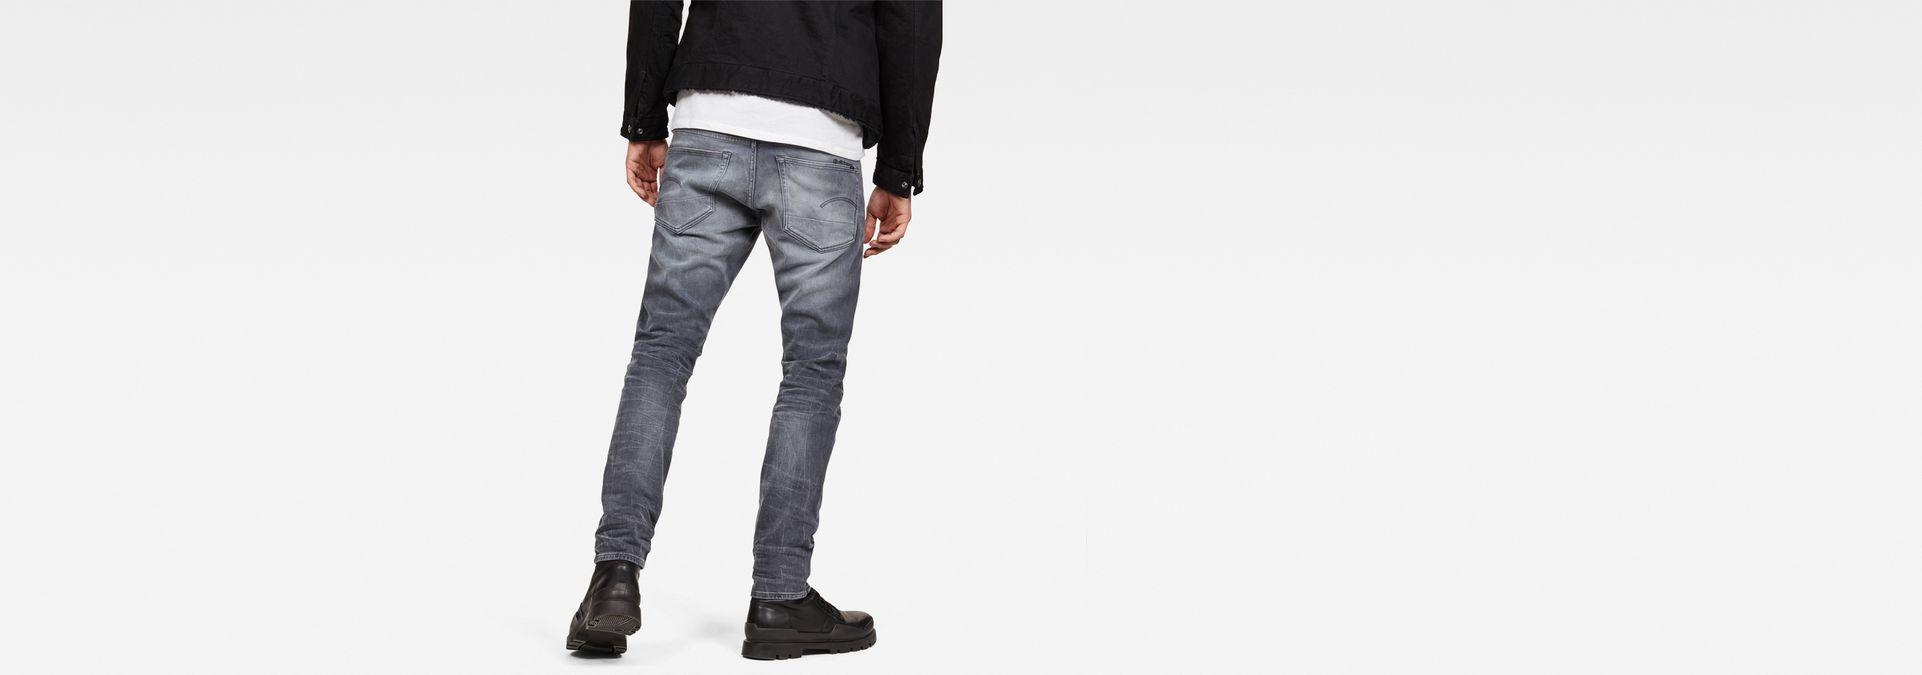 G STAR 3301 Tapered Kess Stretch Jeans voor Heren Grijs